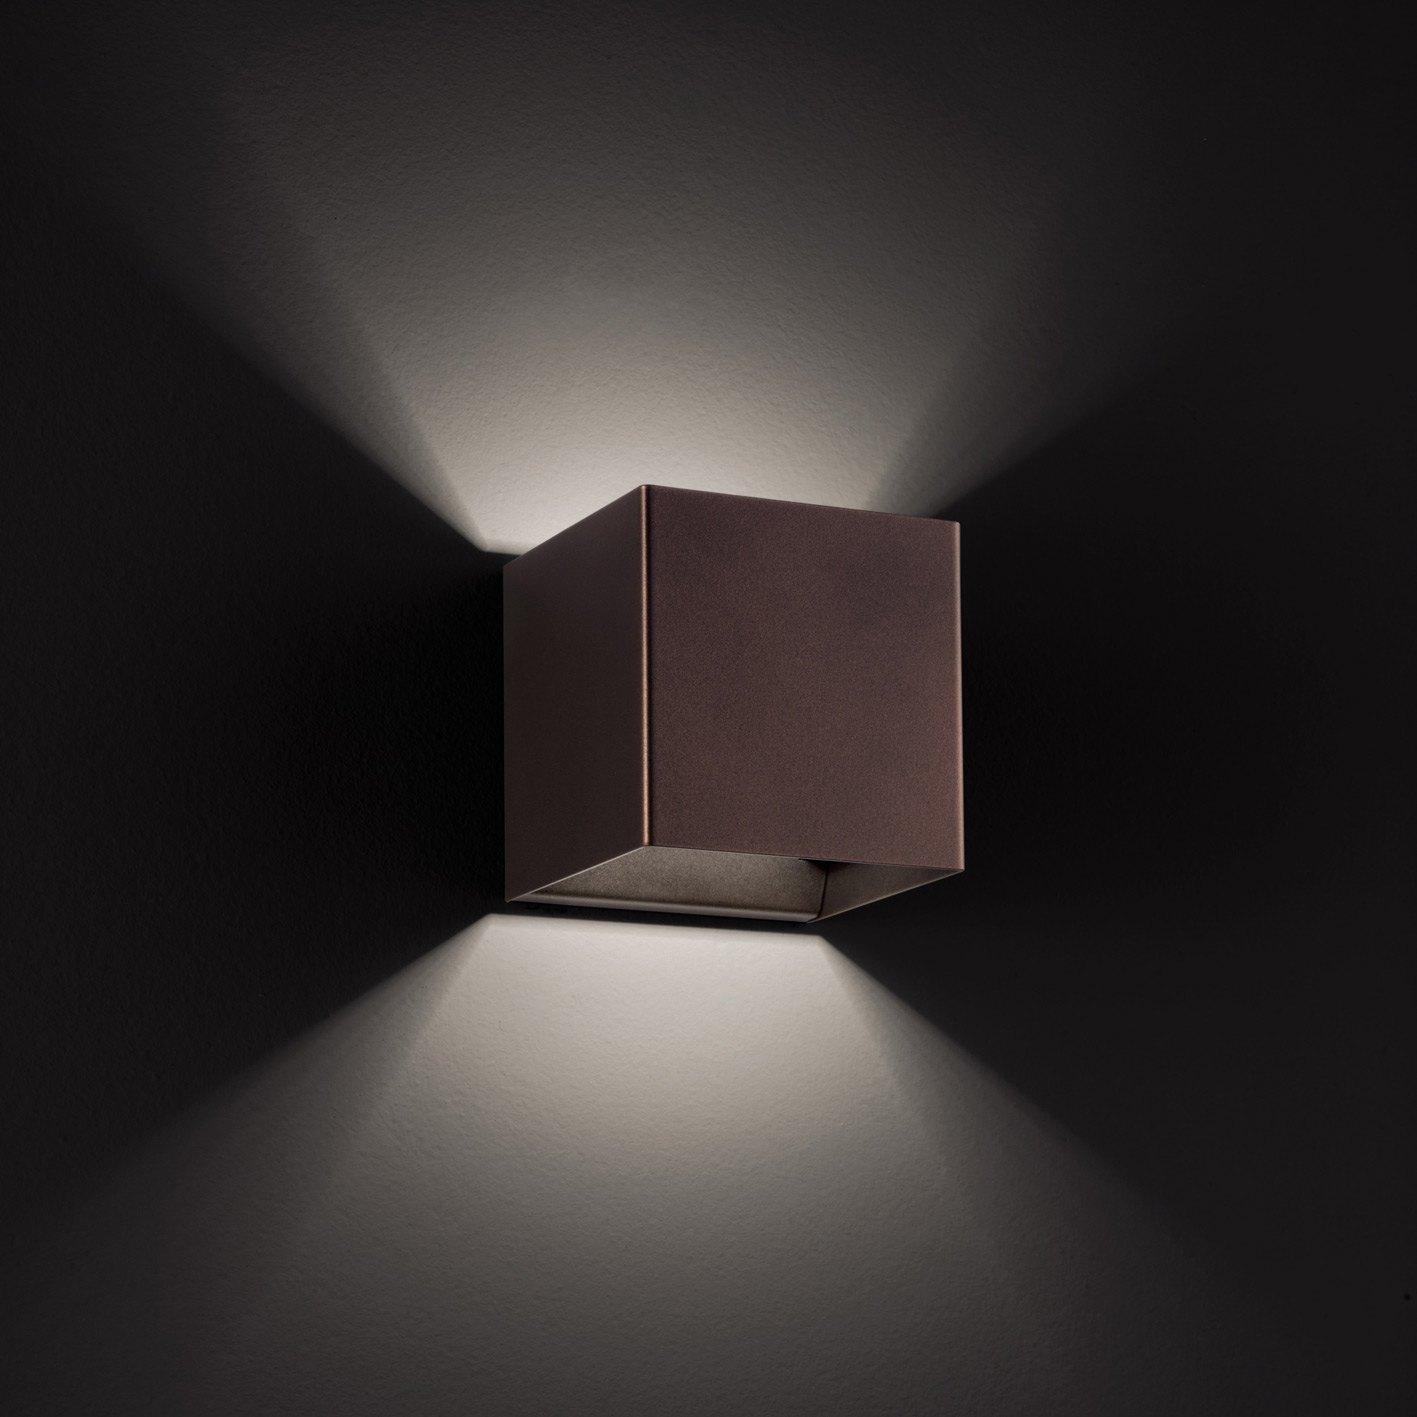 laser cube 10x10 ap9 ap11 led wall light by studio italia design. Black Bedroom Furniture Sets. Home Design Ideas